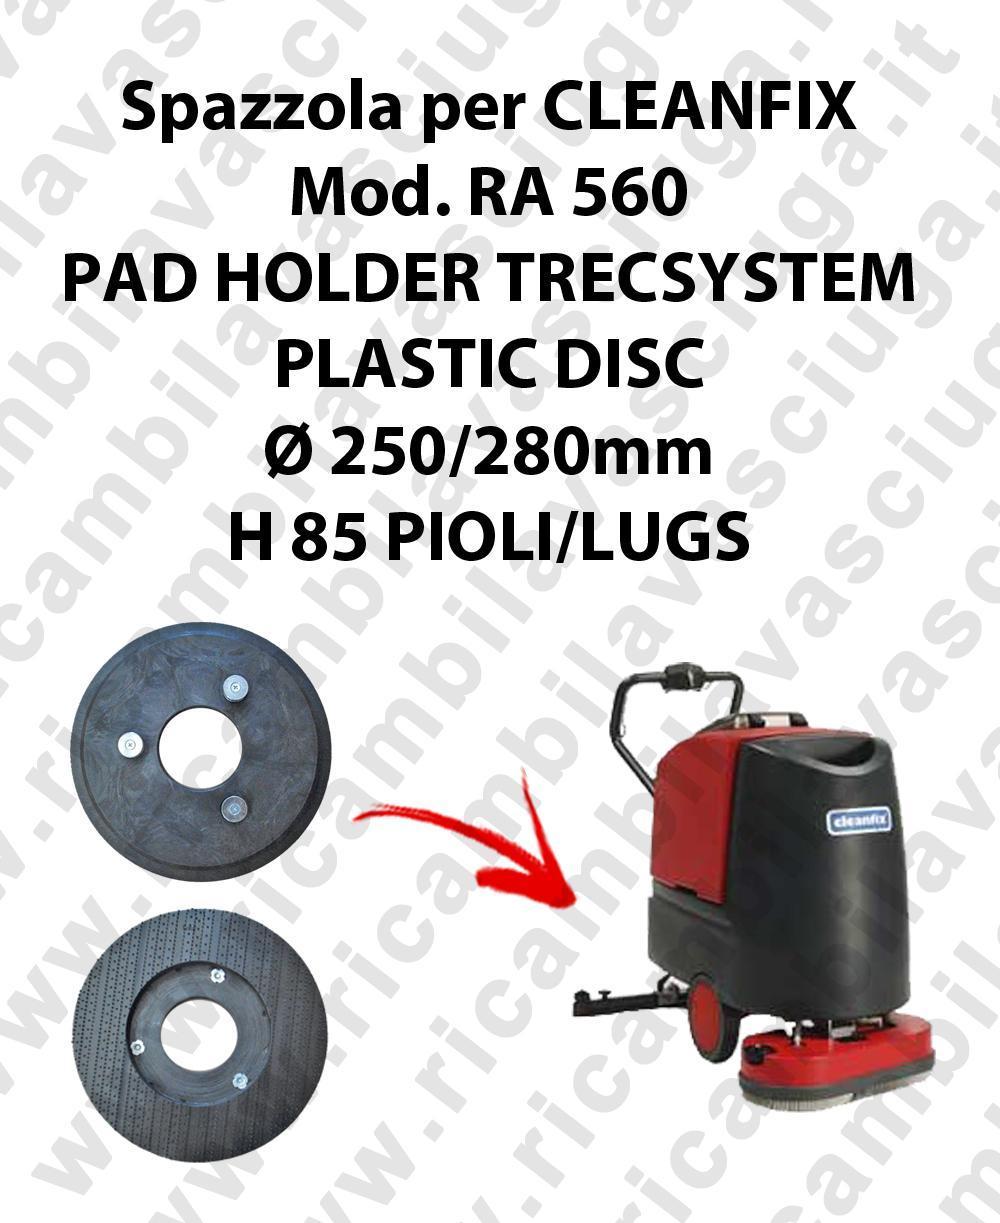 PAD HOLDER TRECSYSTEM  pour autolaveuses CLEANFIX Reference RA 560